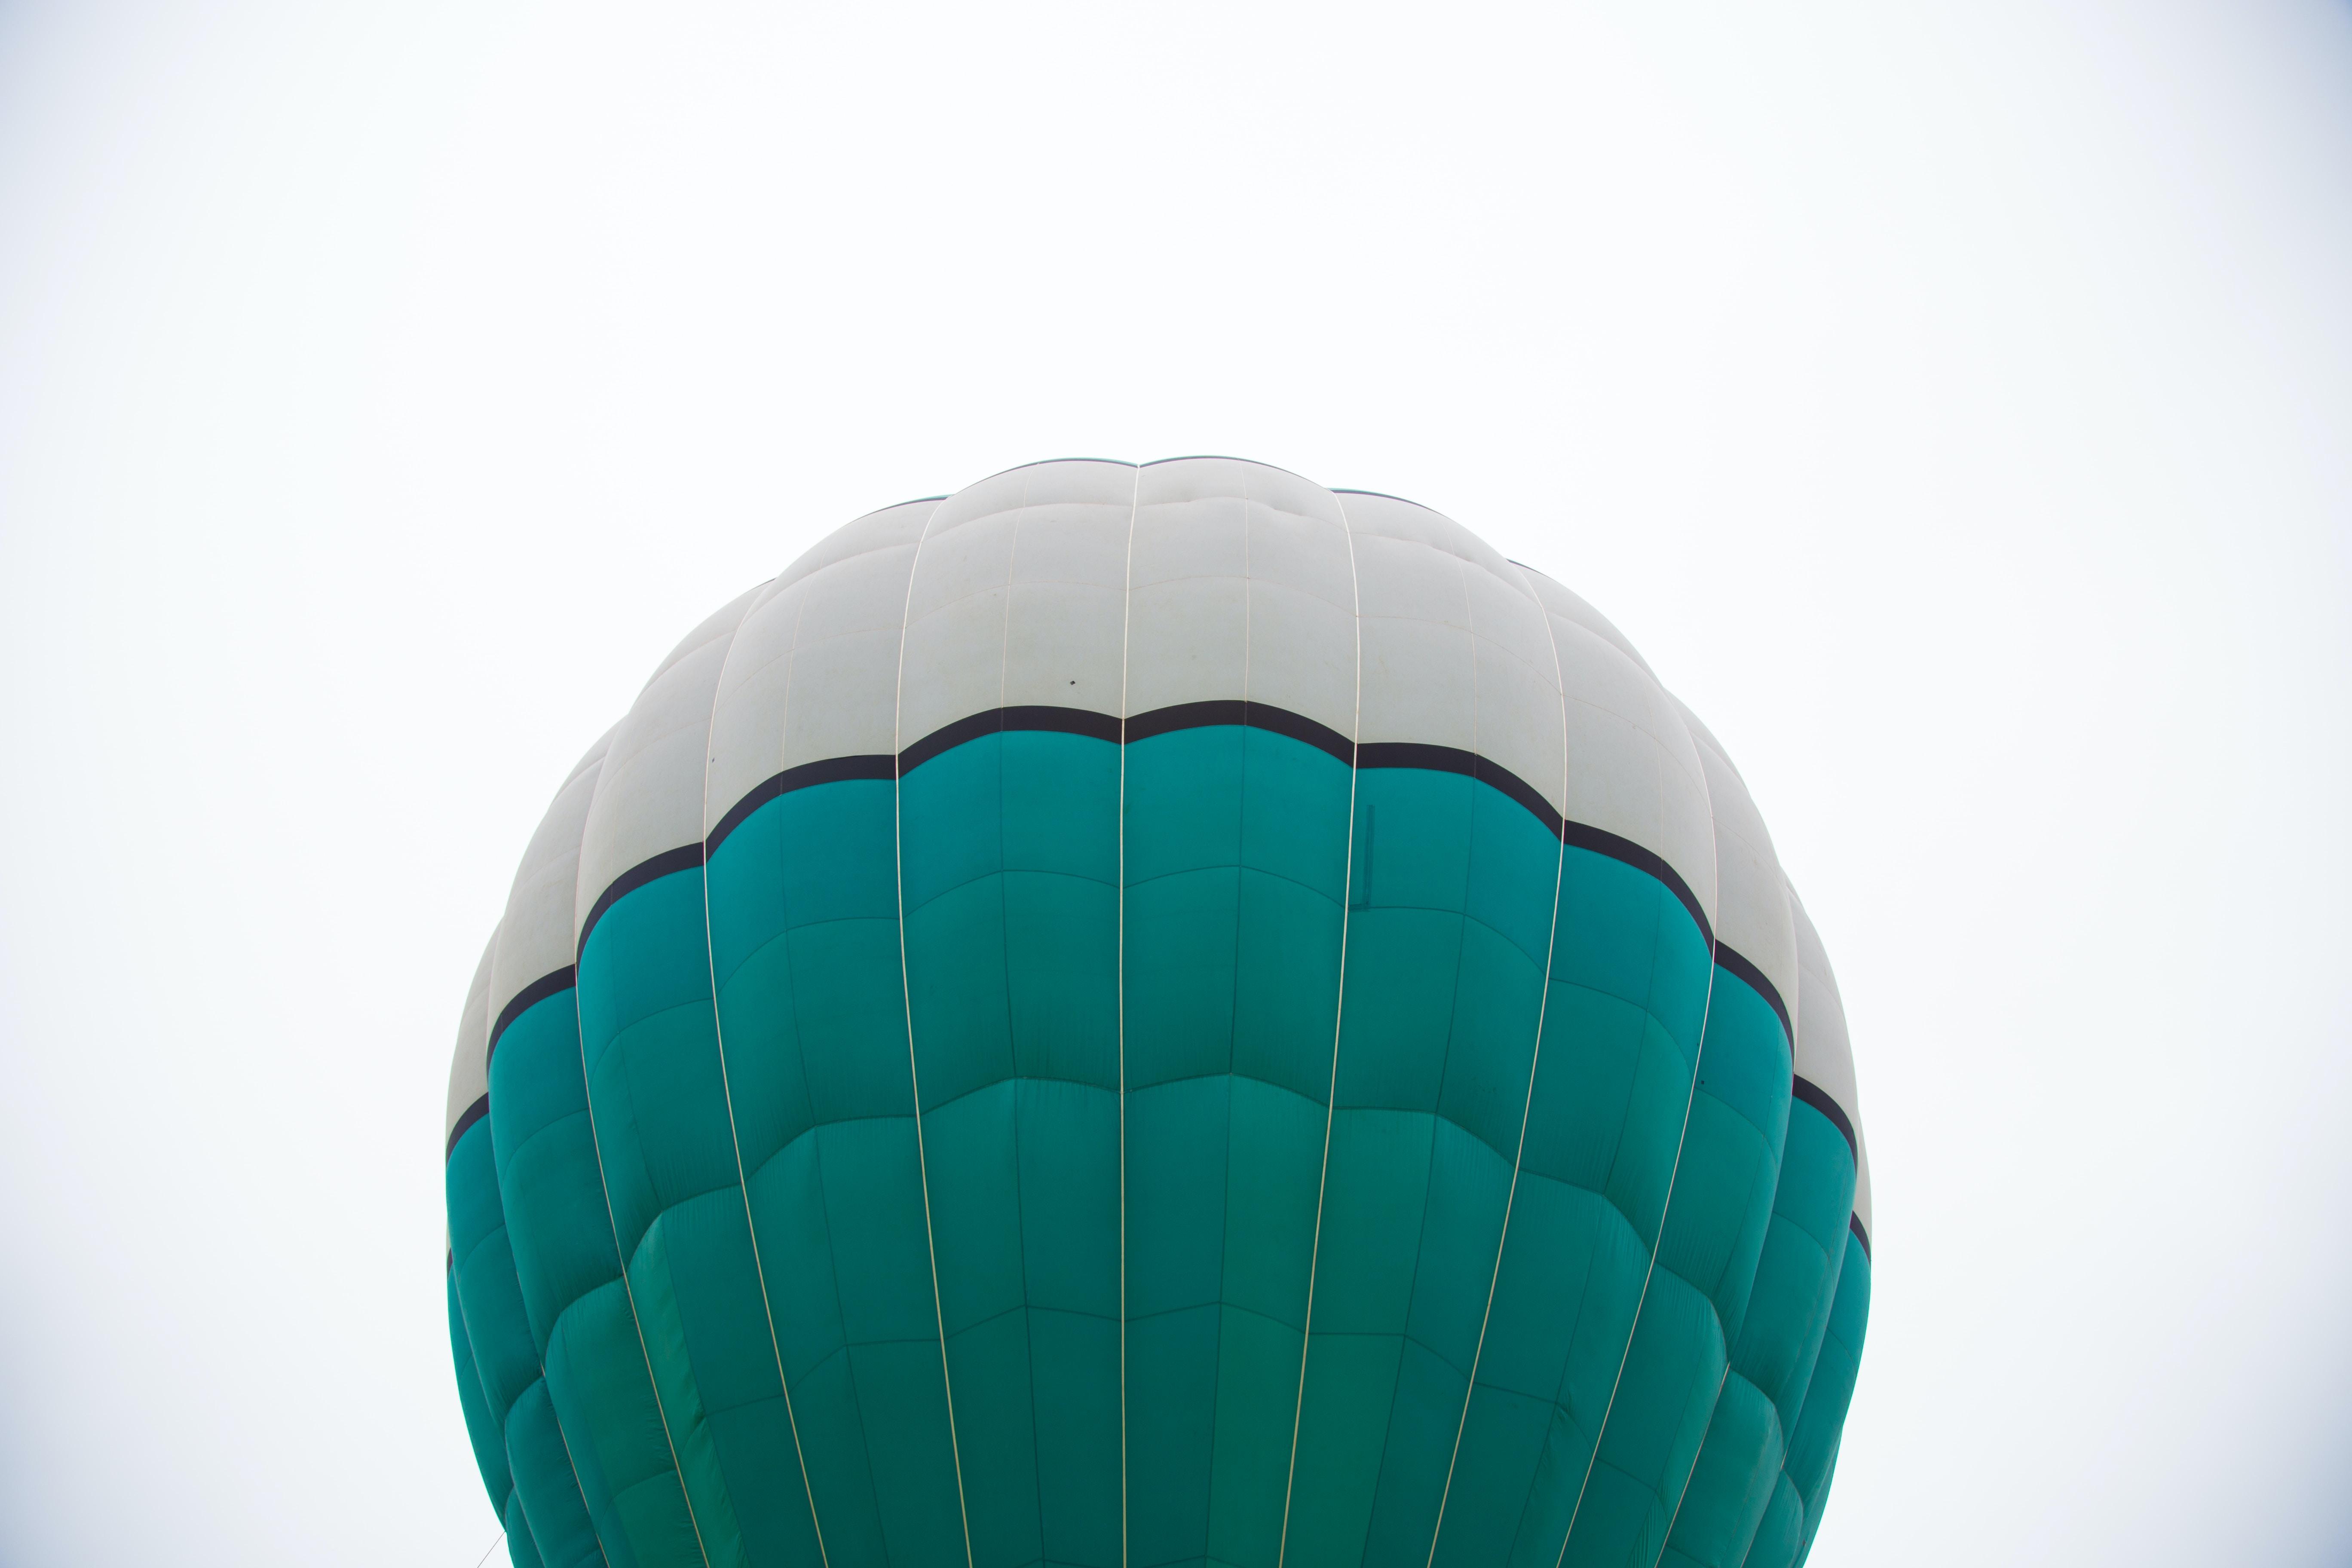 green and white hot air balloon